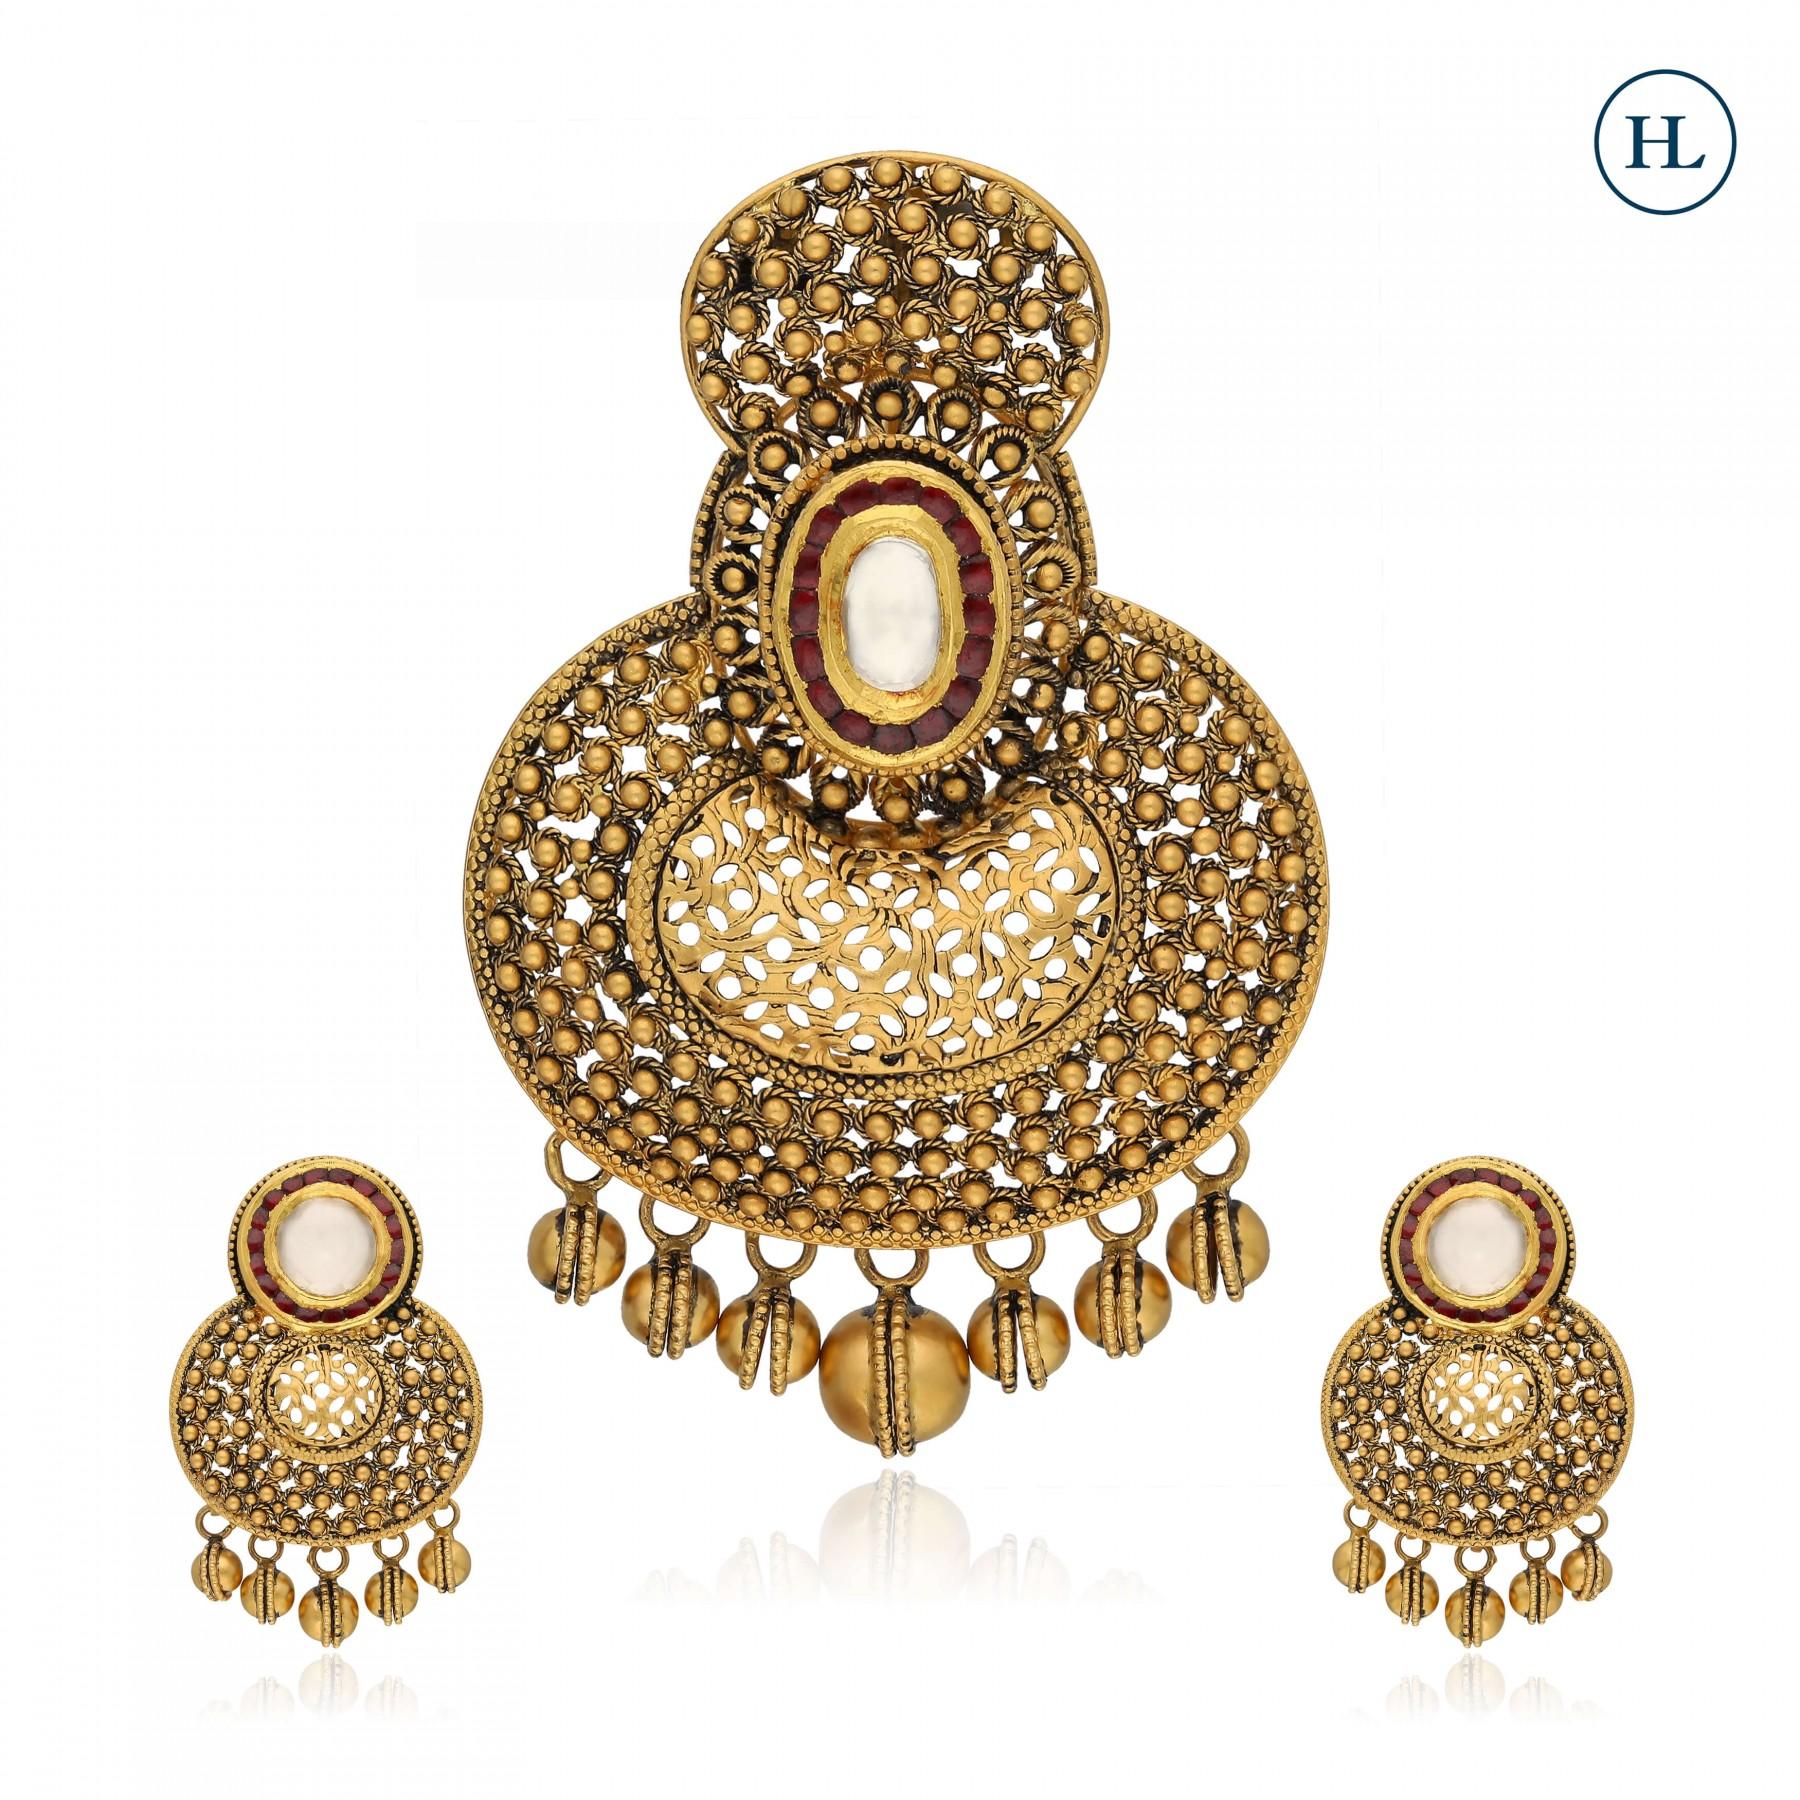 Antique-Styled Kundan & Gold Pendant Set